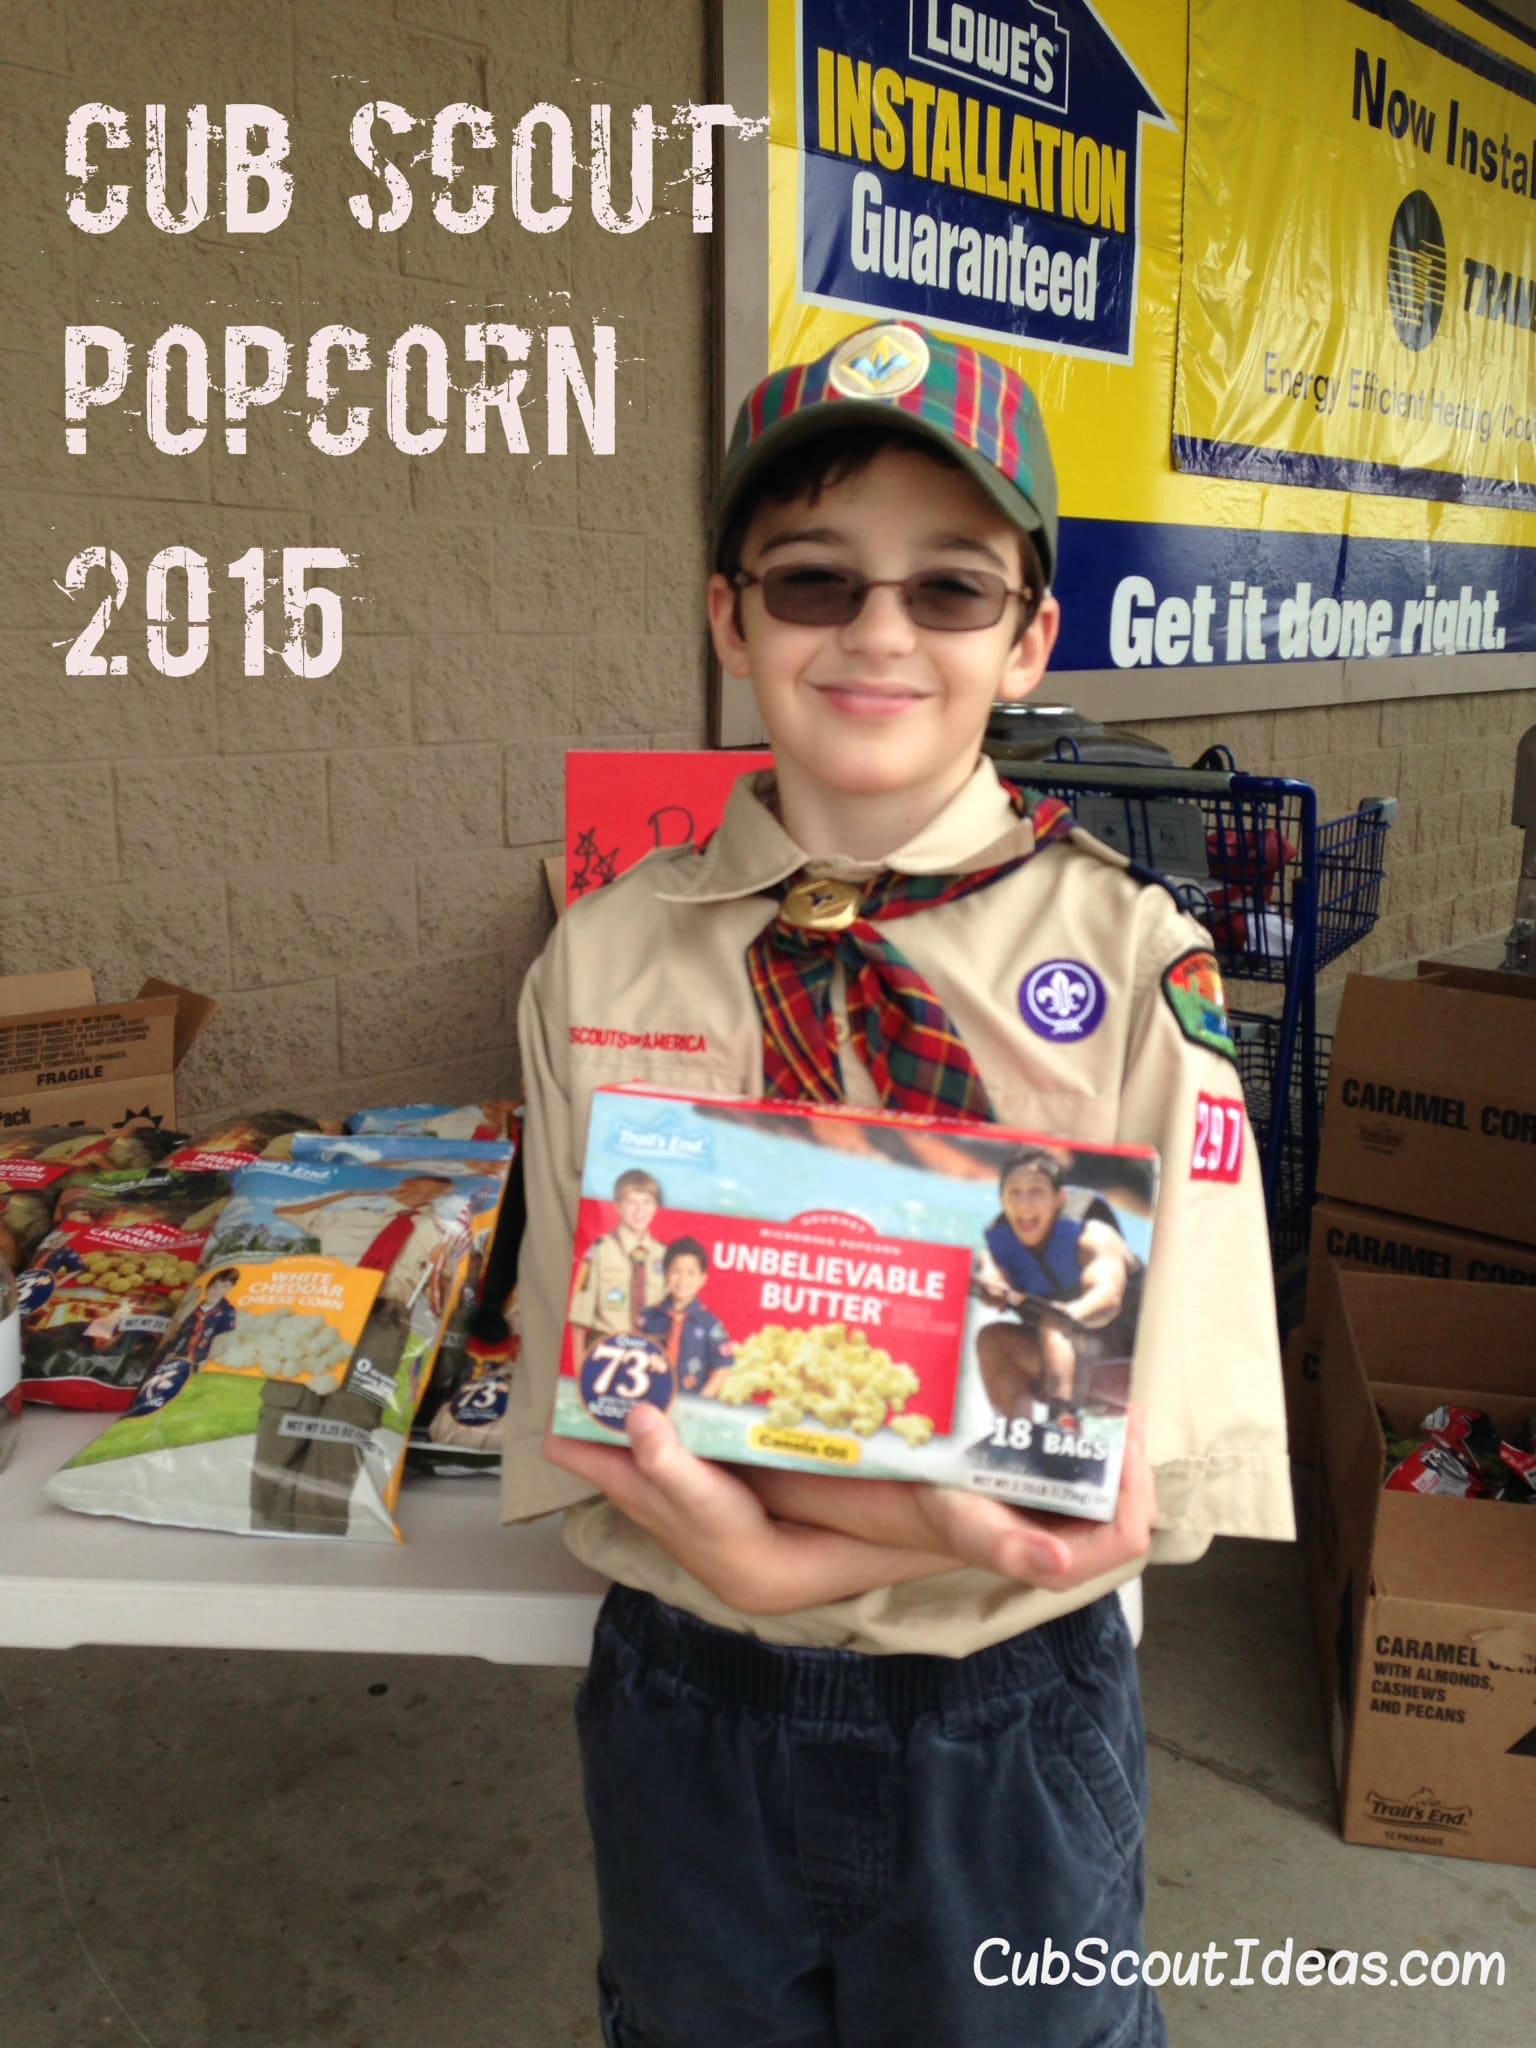 Cub Scout Popcorn Sale 2015